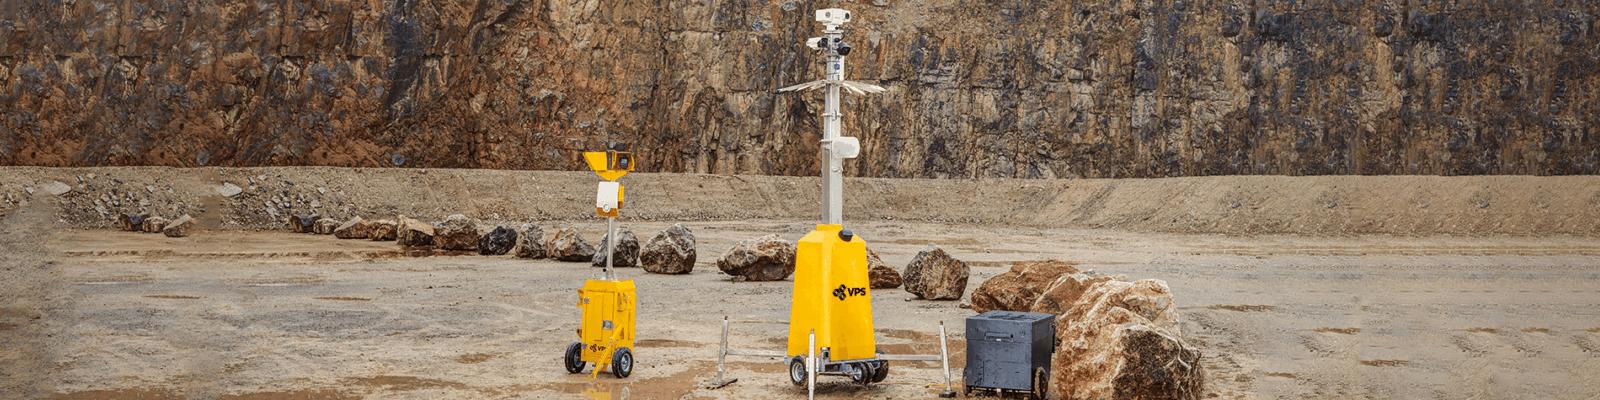 Mobile Drahtlose Videouberwachung Jcb Smarttower Cct